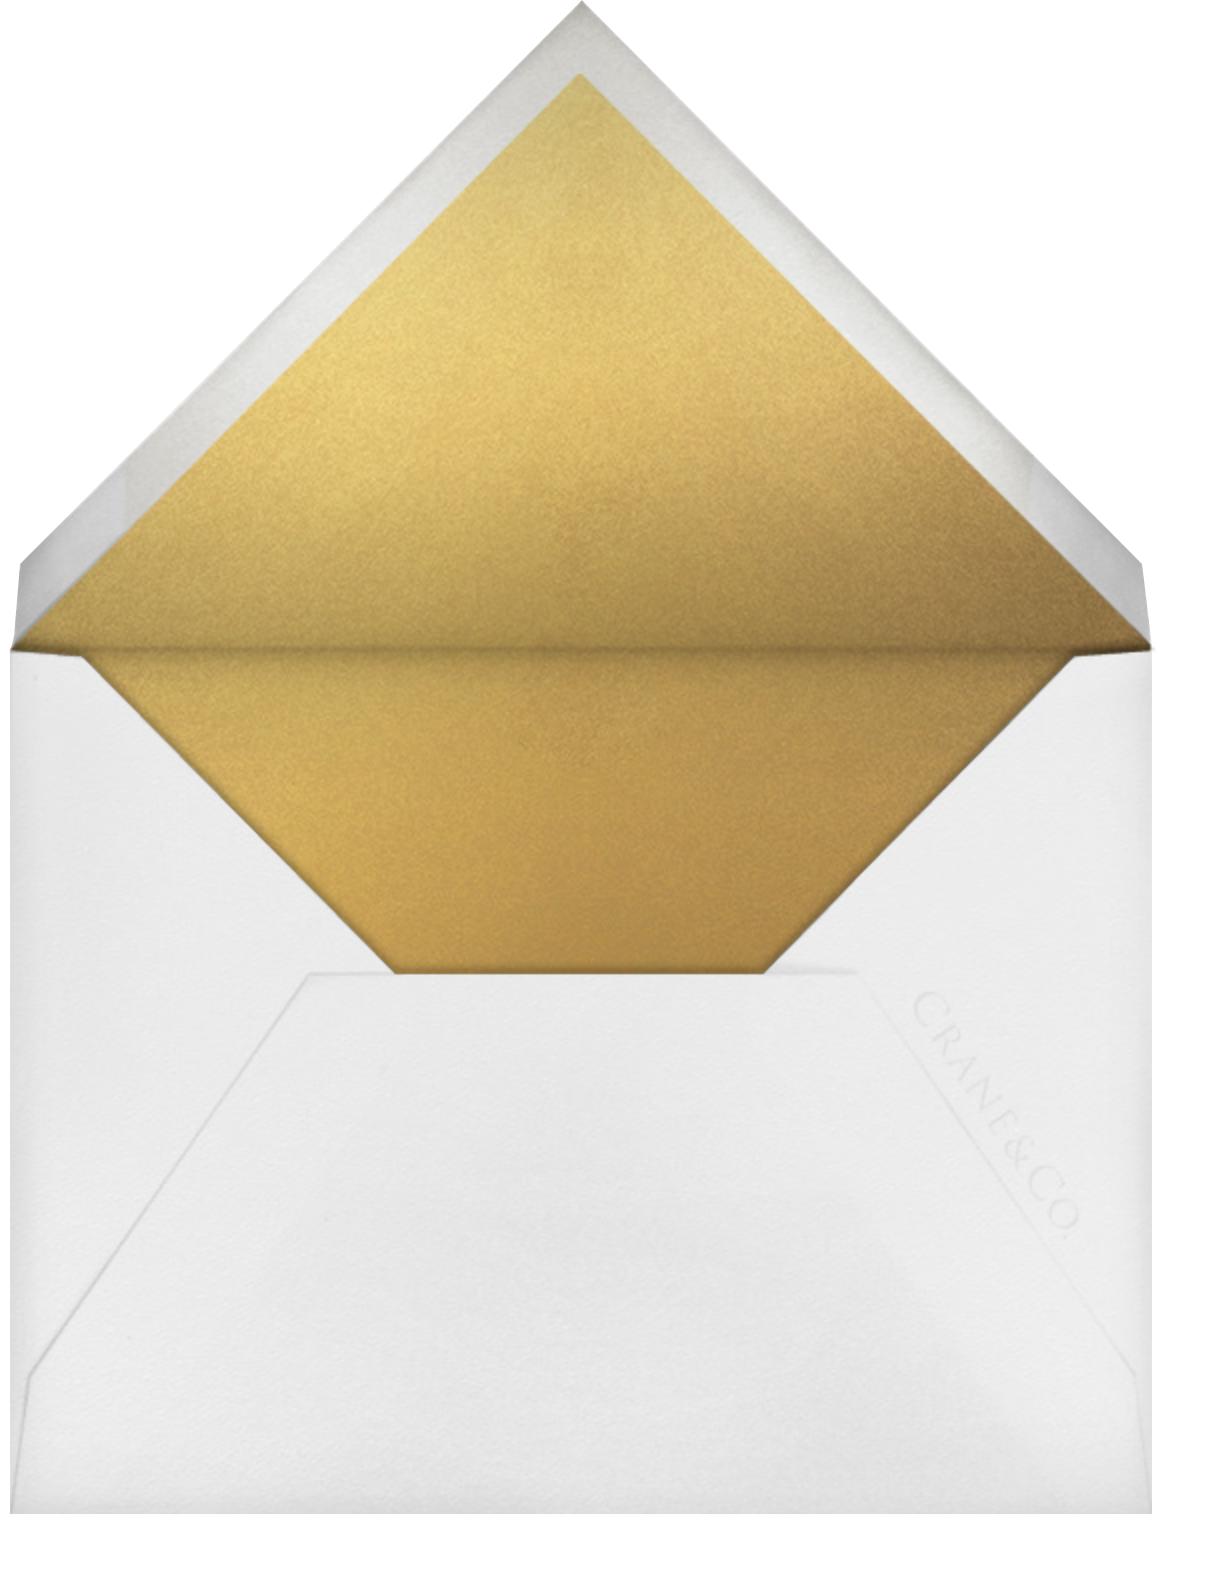 Bellarmin - Paperless Post - Envelope